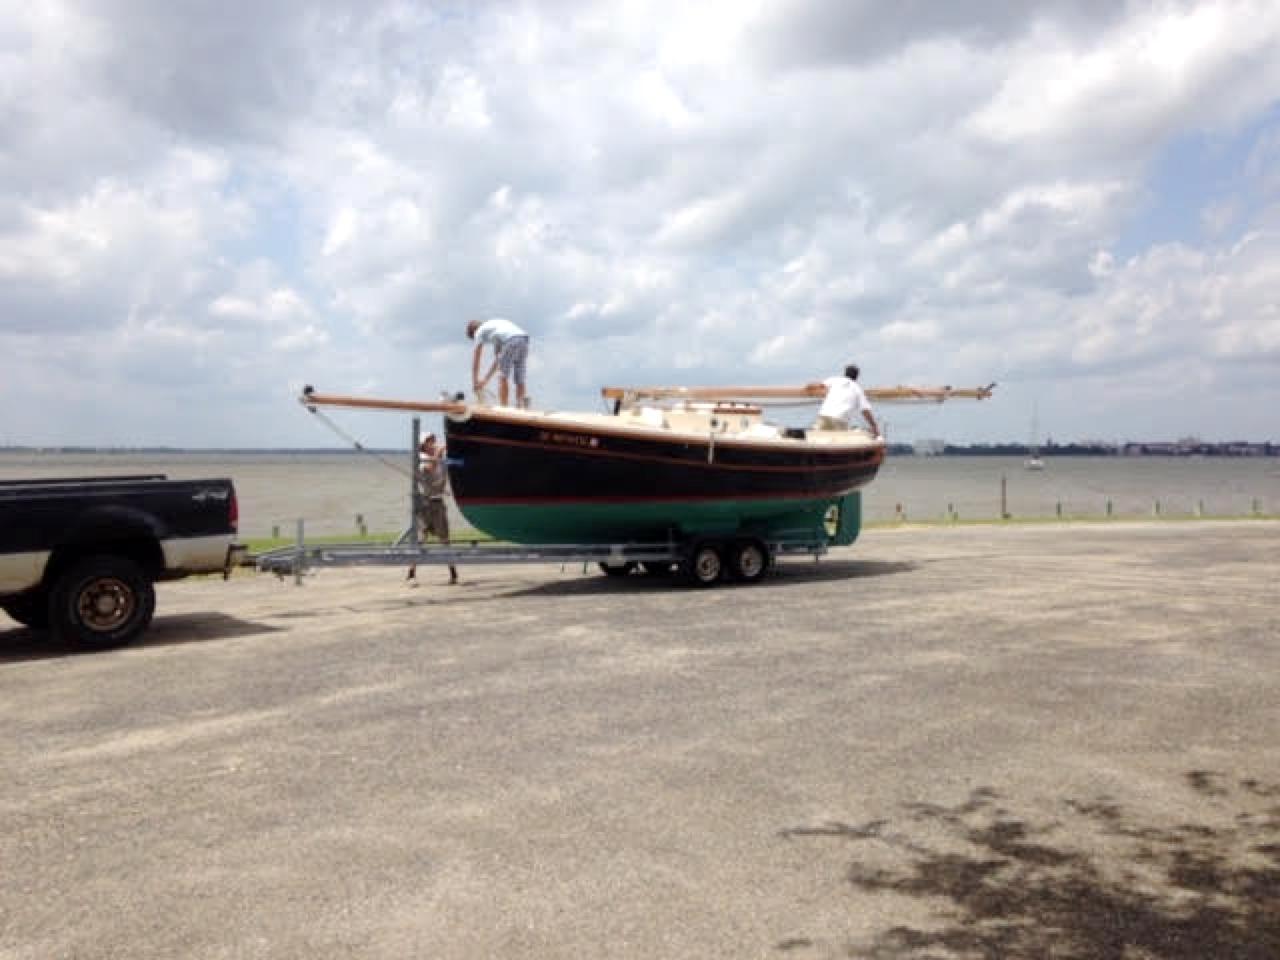 Cornish Crabbers Crabber 22 - mast folds flat for transport